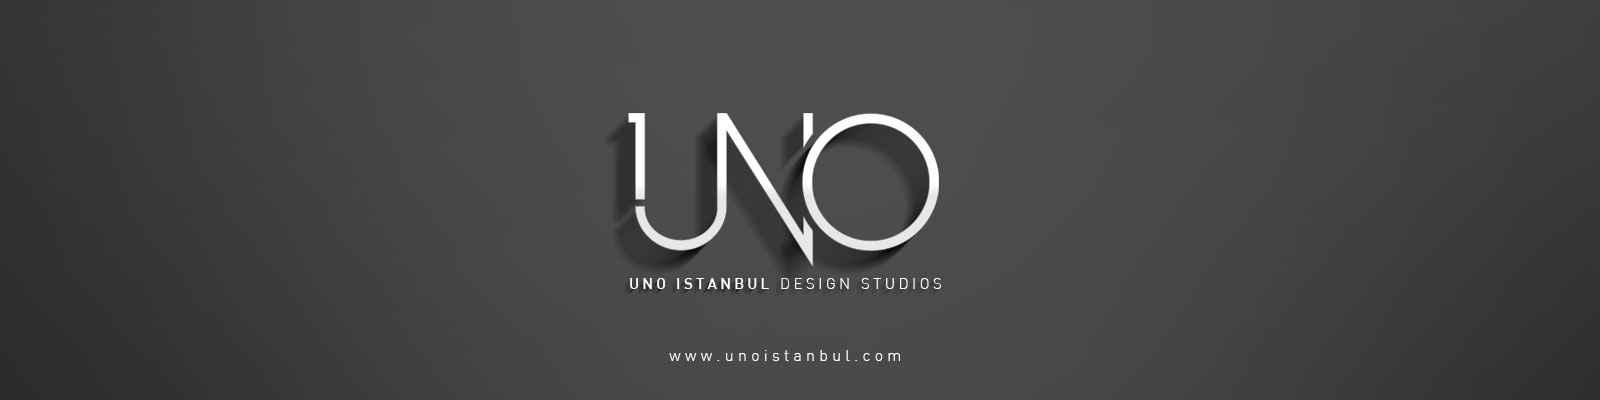 UNO İstanbul banner fotograf